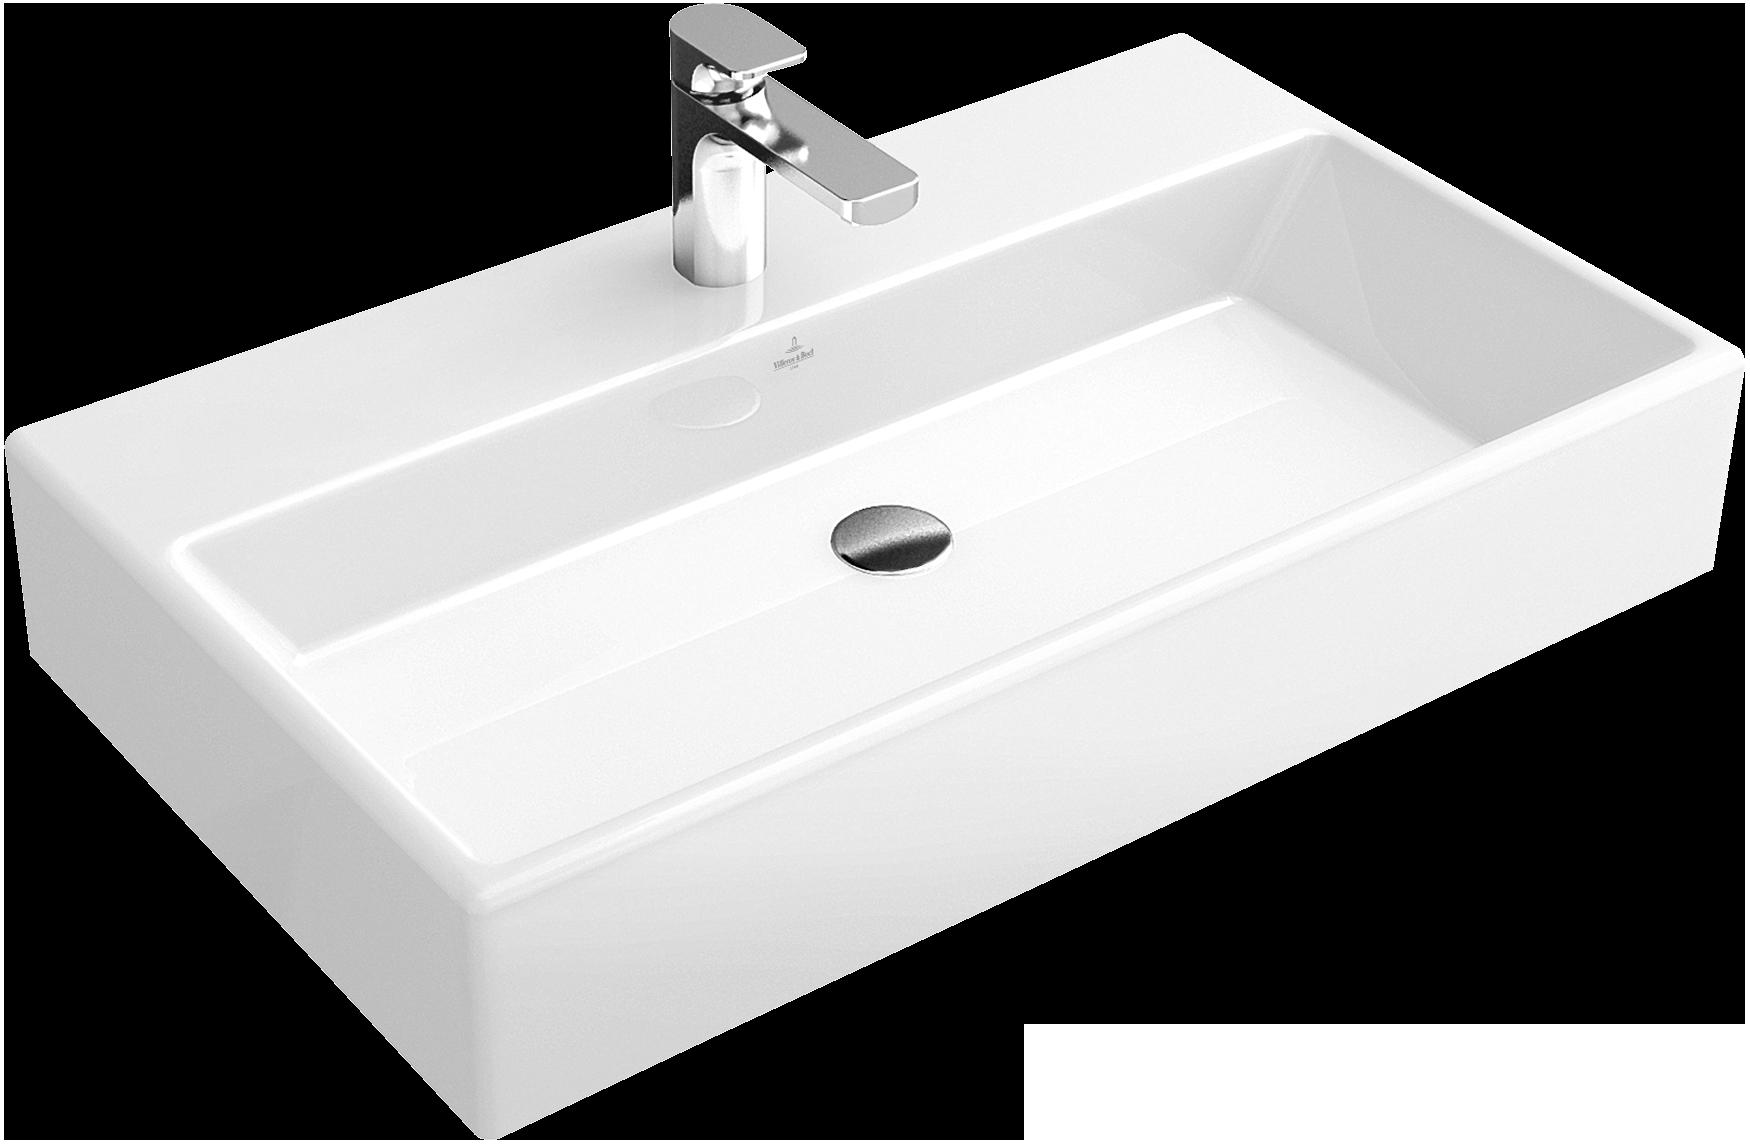 Memento Washbasin Angular 51338J - Villeroy & Boch